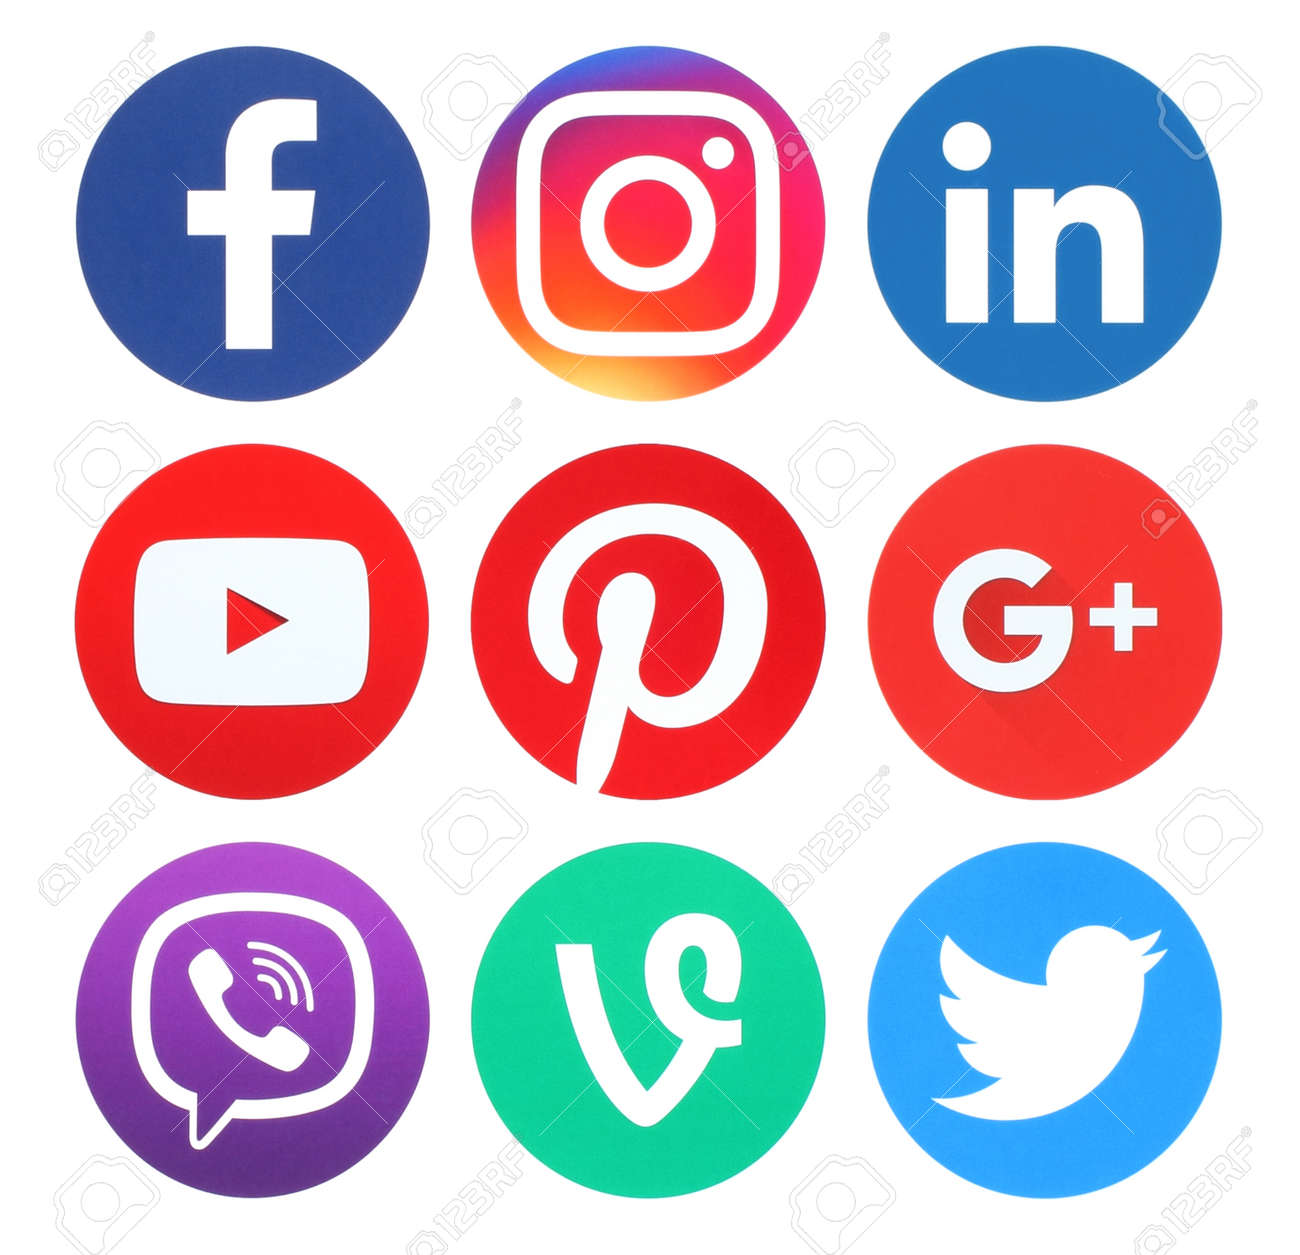 Kiev, Ukraine - May 26, 2016: Collection of popular round social media logos printed on paper:Facebook, Twitter, Google Plus, Instagram, LinkedIn, Pinterest, Vine, Youtube and Viber - 58497427